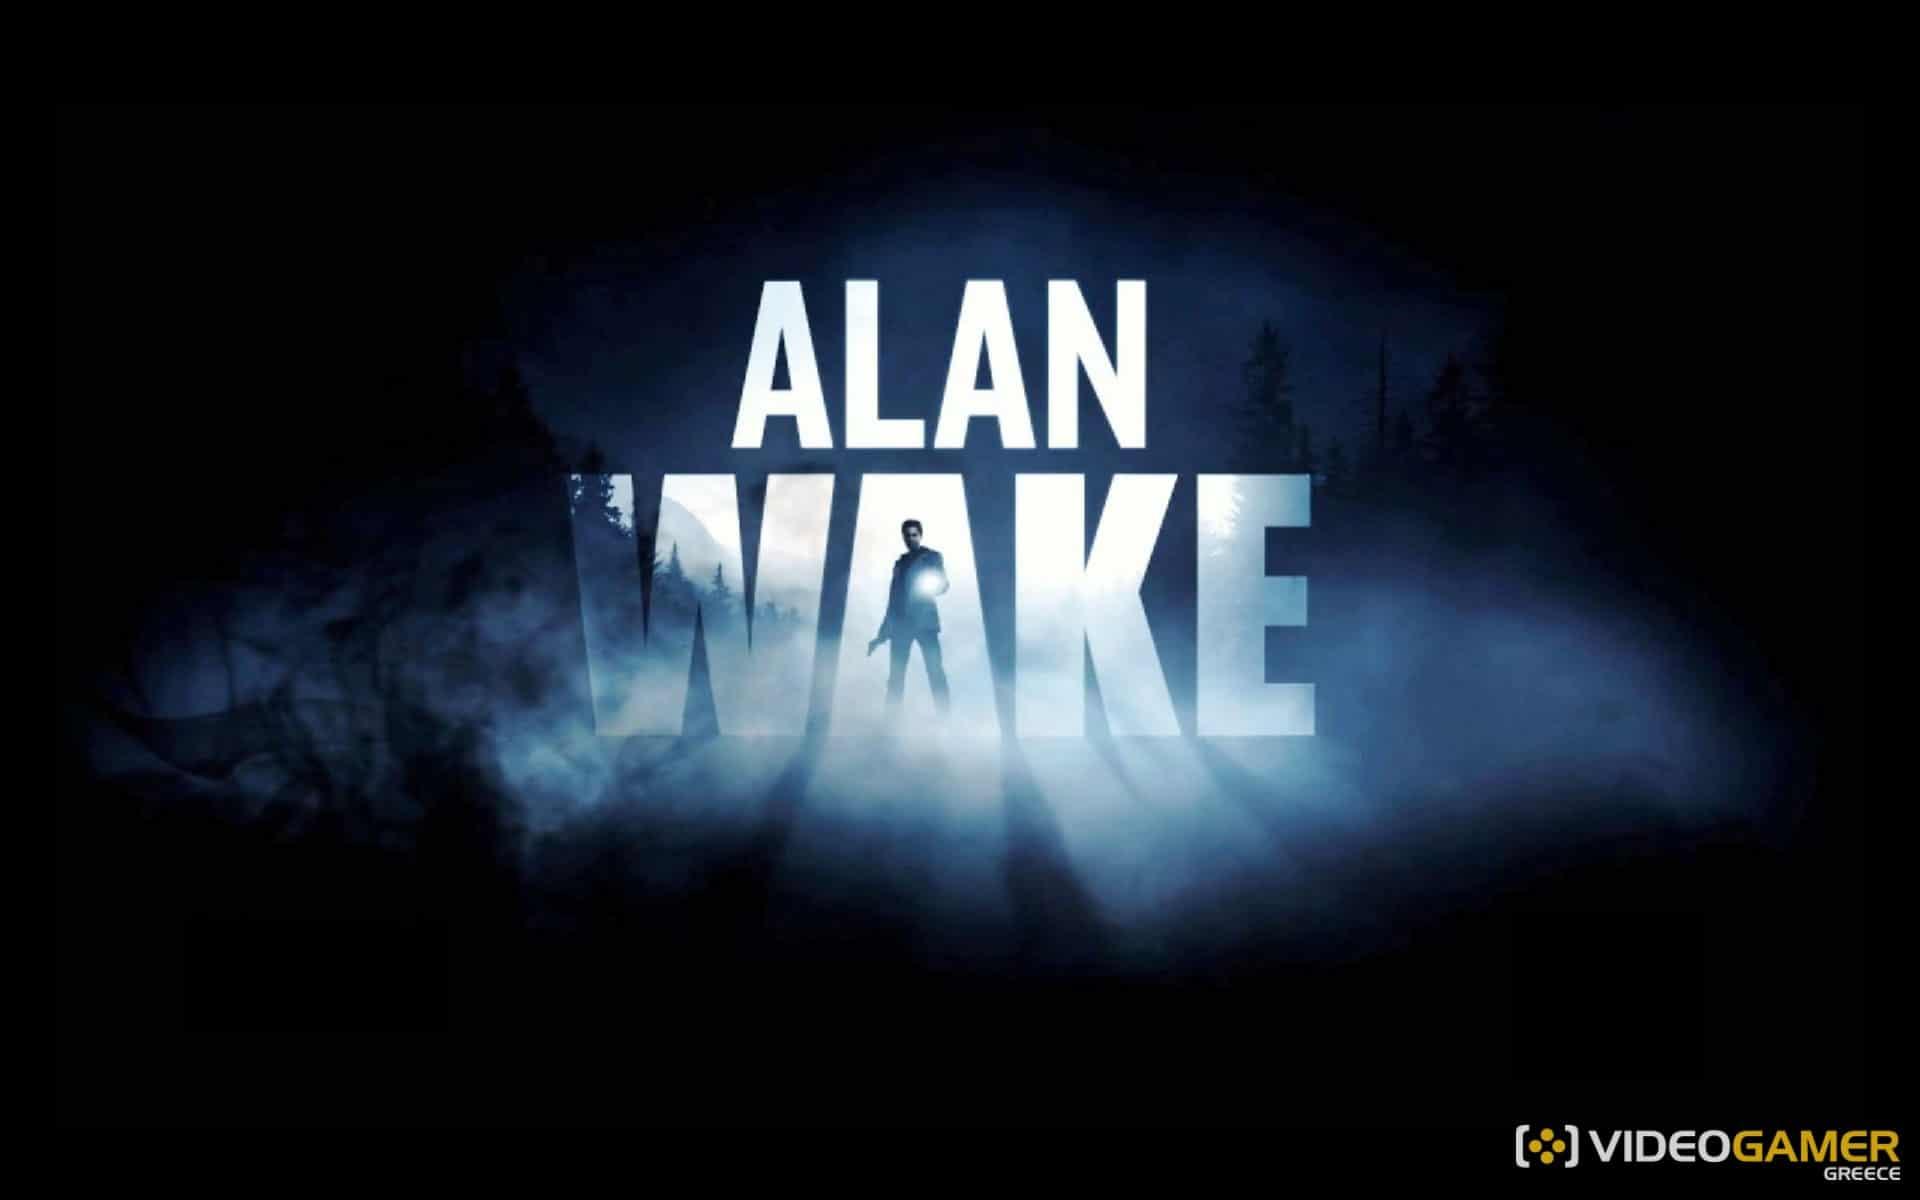 alan-wake-cover